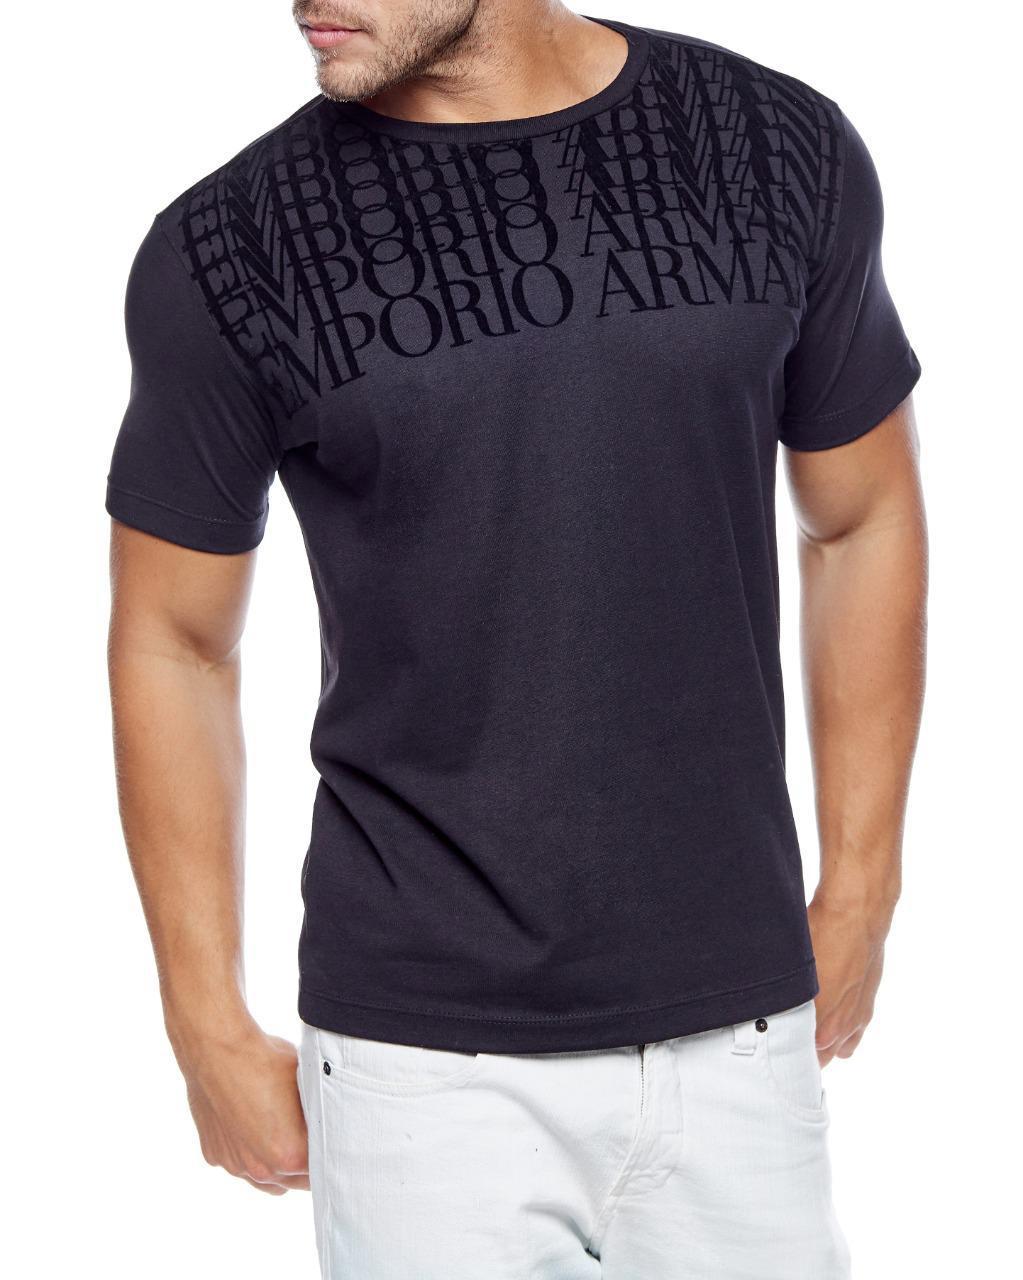 Camiseta Emporio Armani Slim Fit Lettering Logo Camurça Cinza